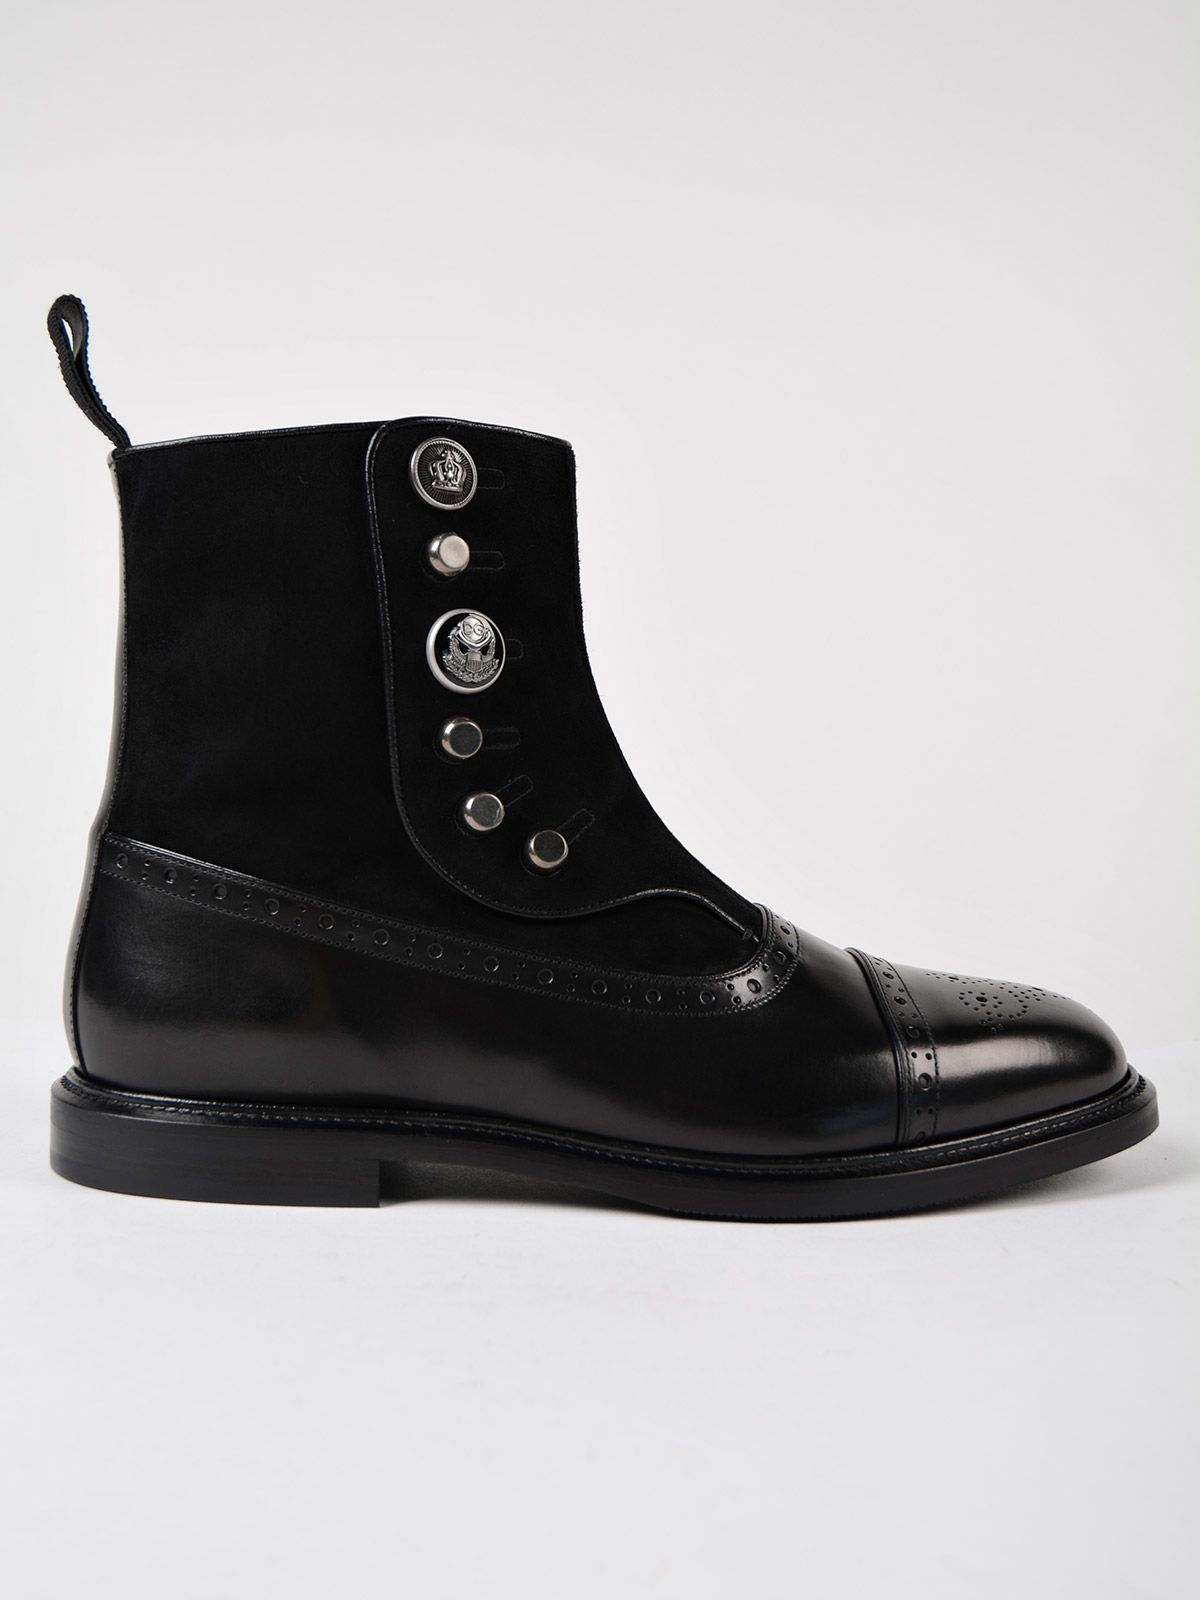 Dolce & Gabbana Dolce & Gabbana Michelangelo Ankle Boots